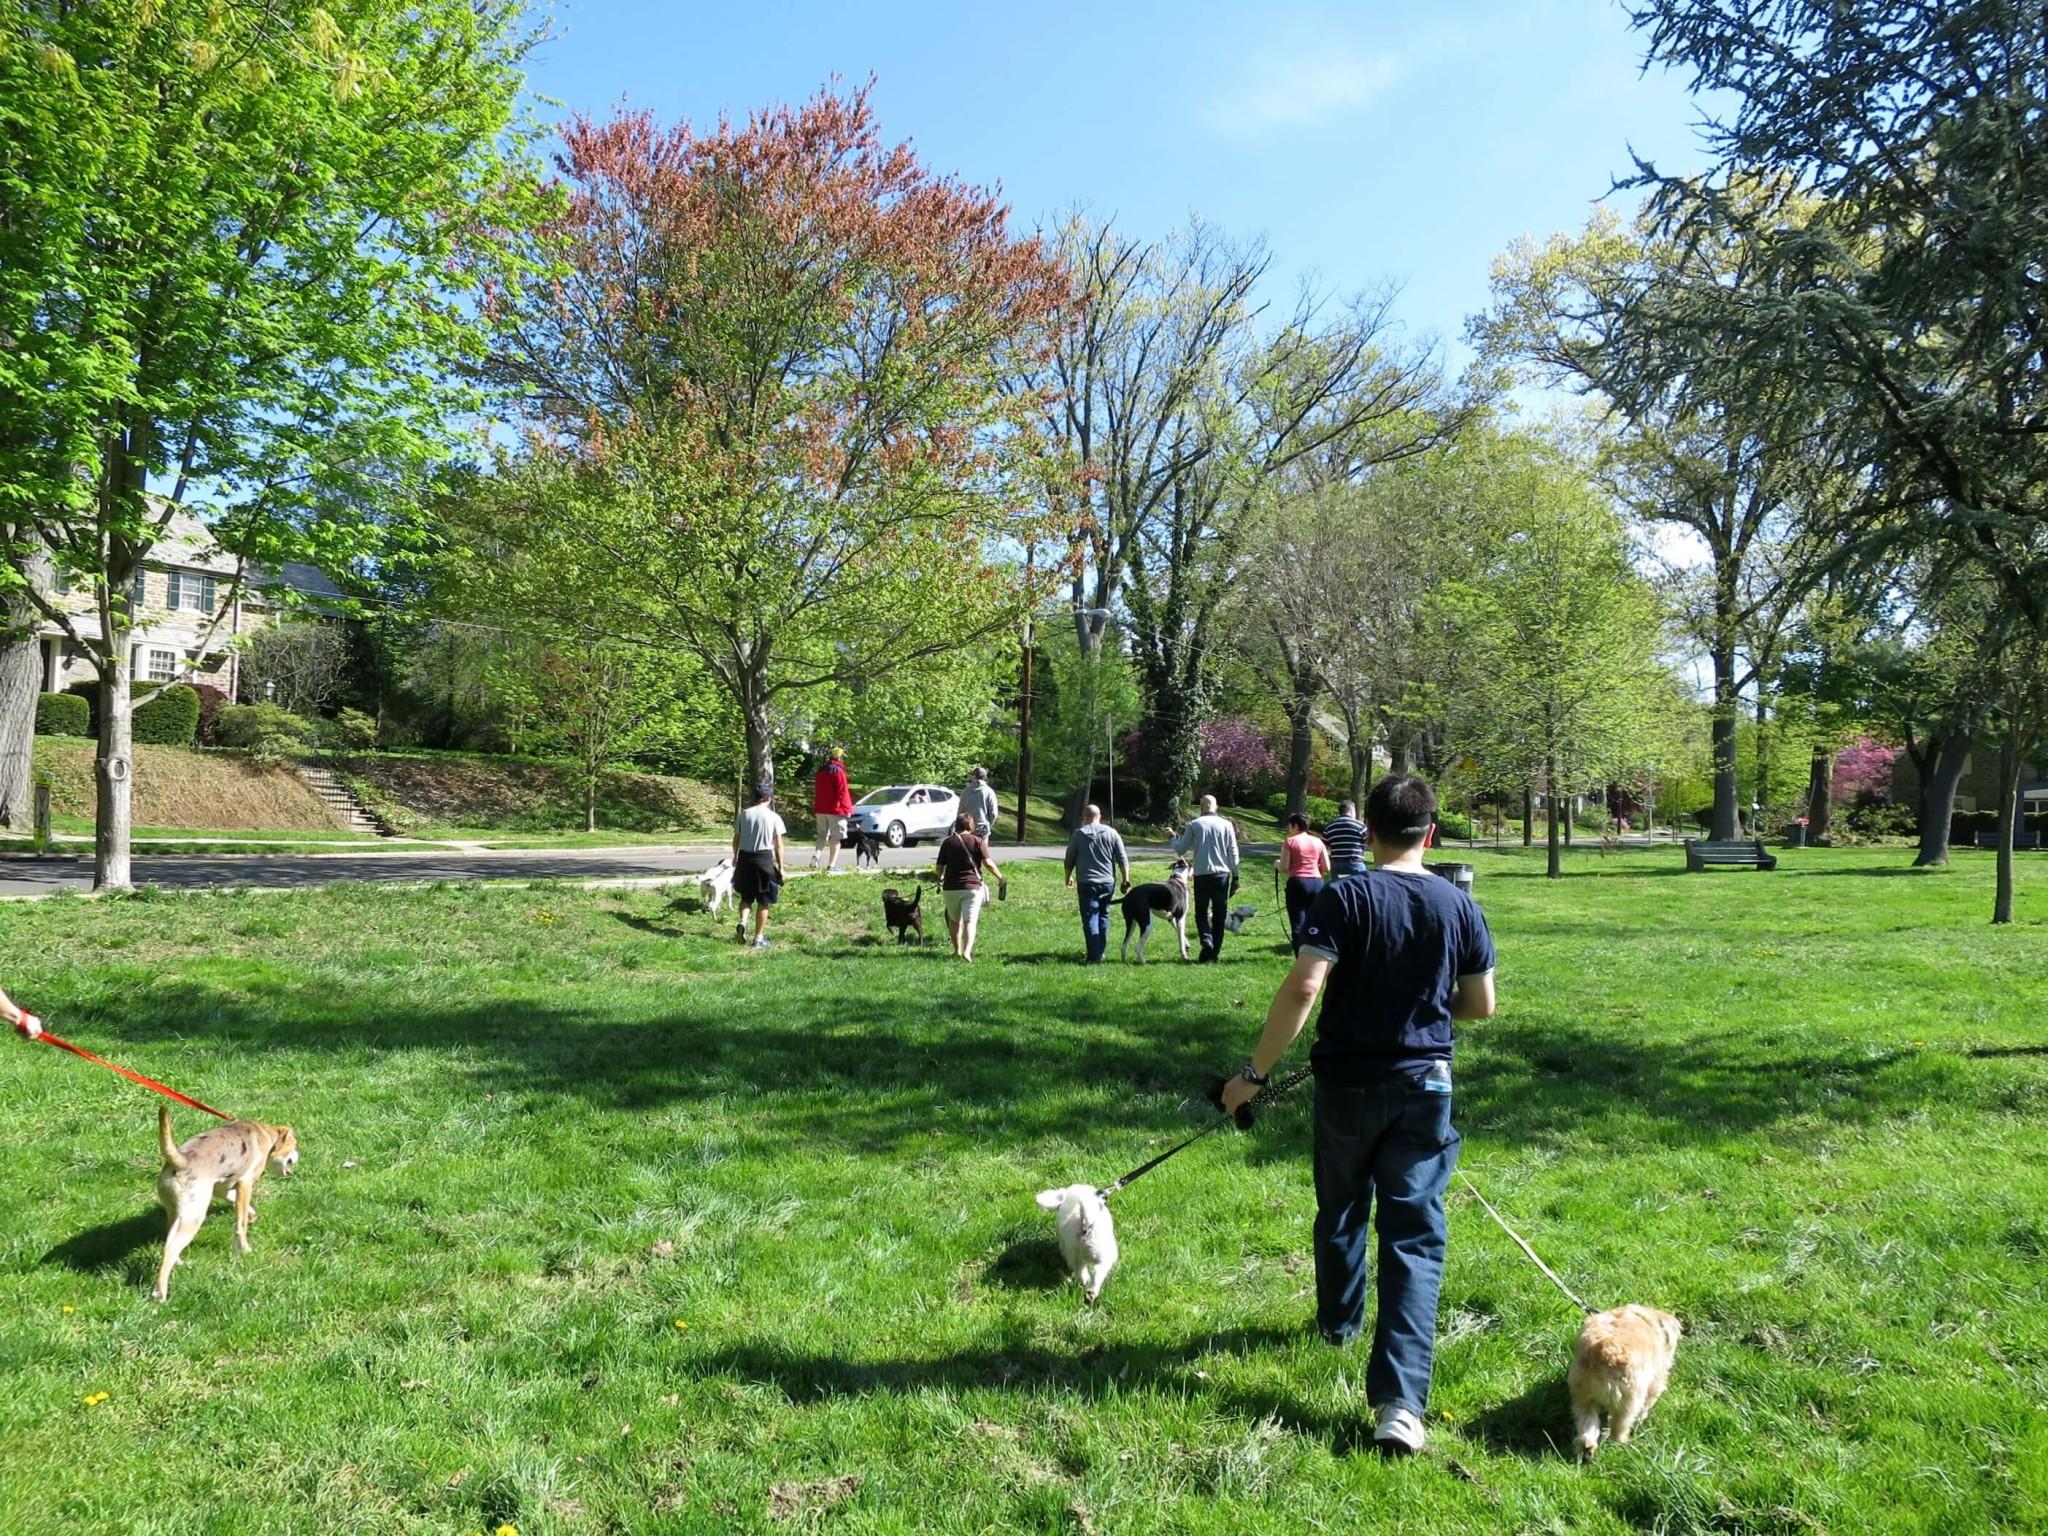 Eastfallslocal 5-3 pack walk starts off mcmichael park behind